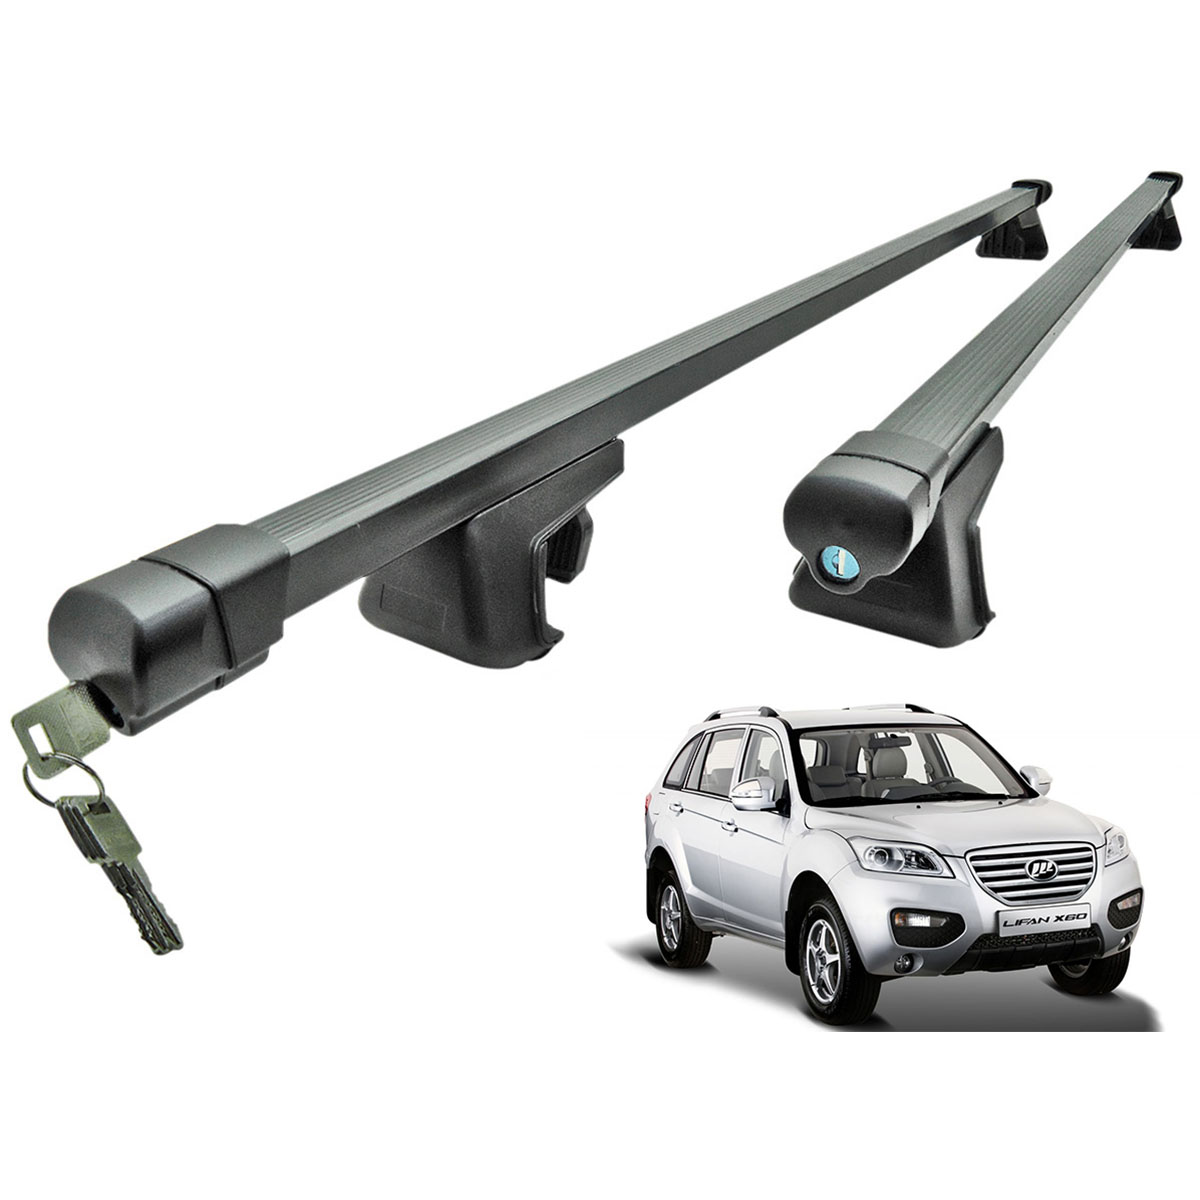 Travessa rack de teto preta com chave Lifan X60 2013 a 2016